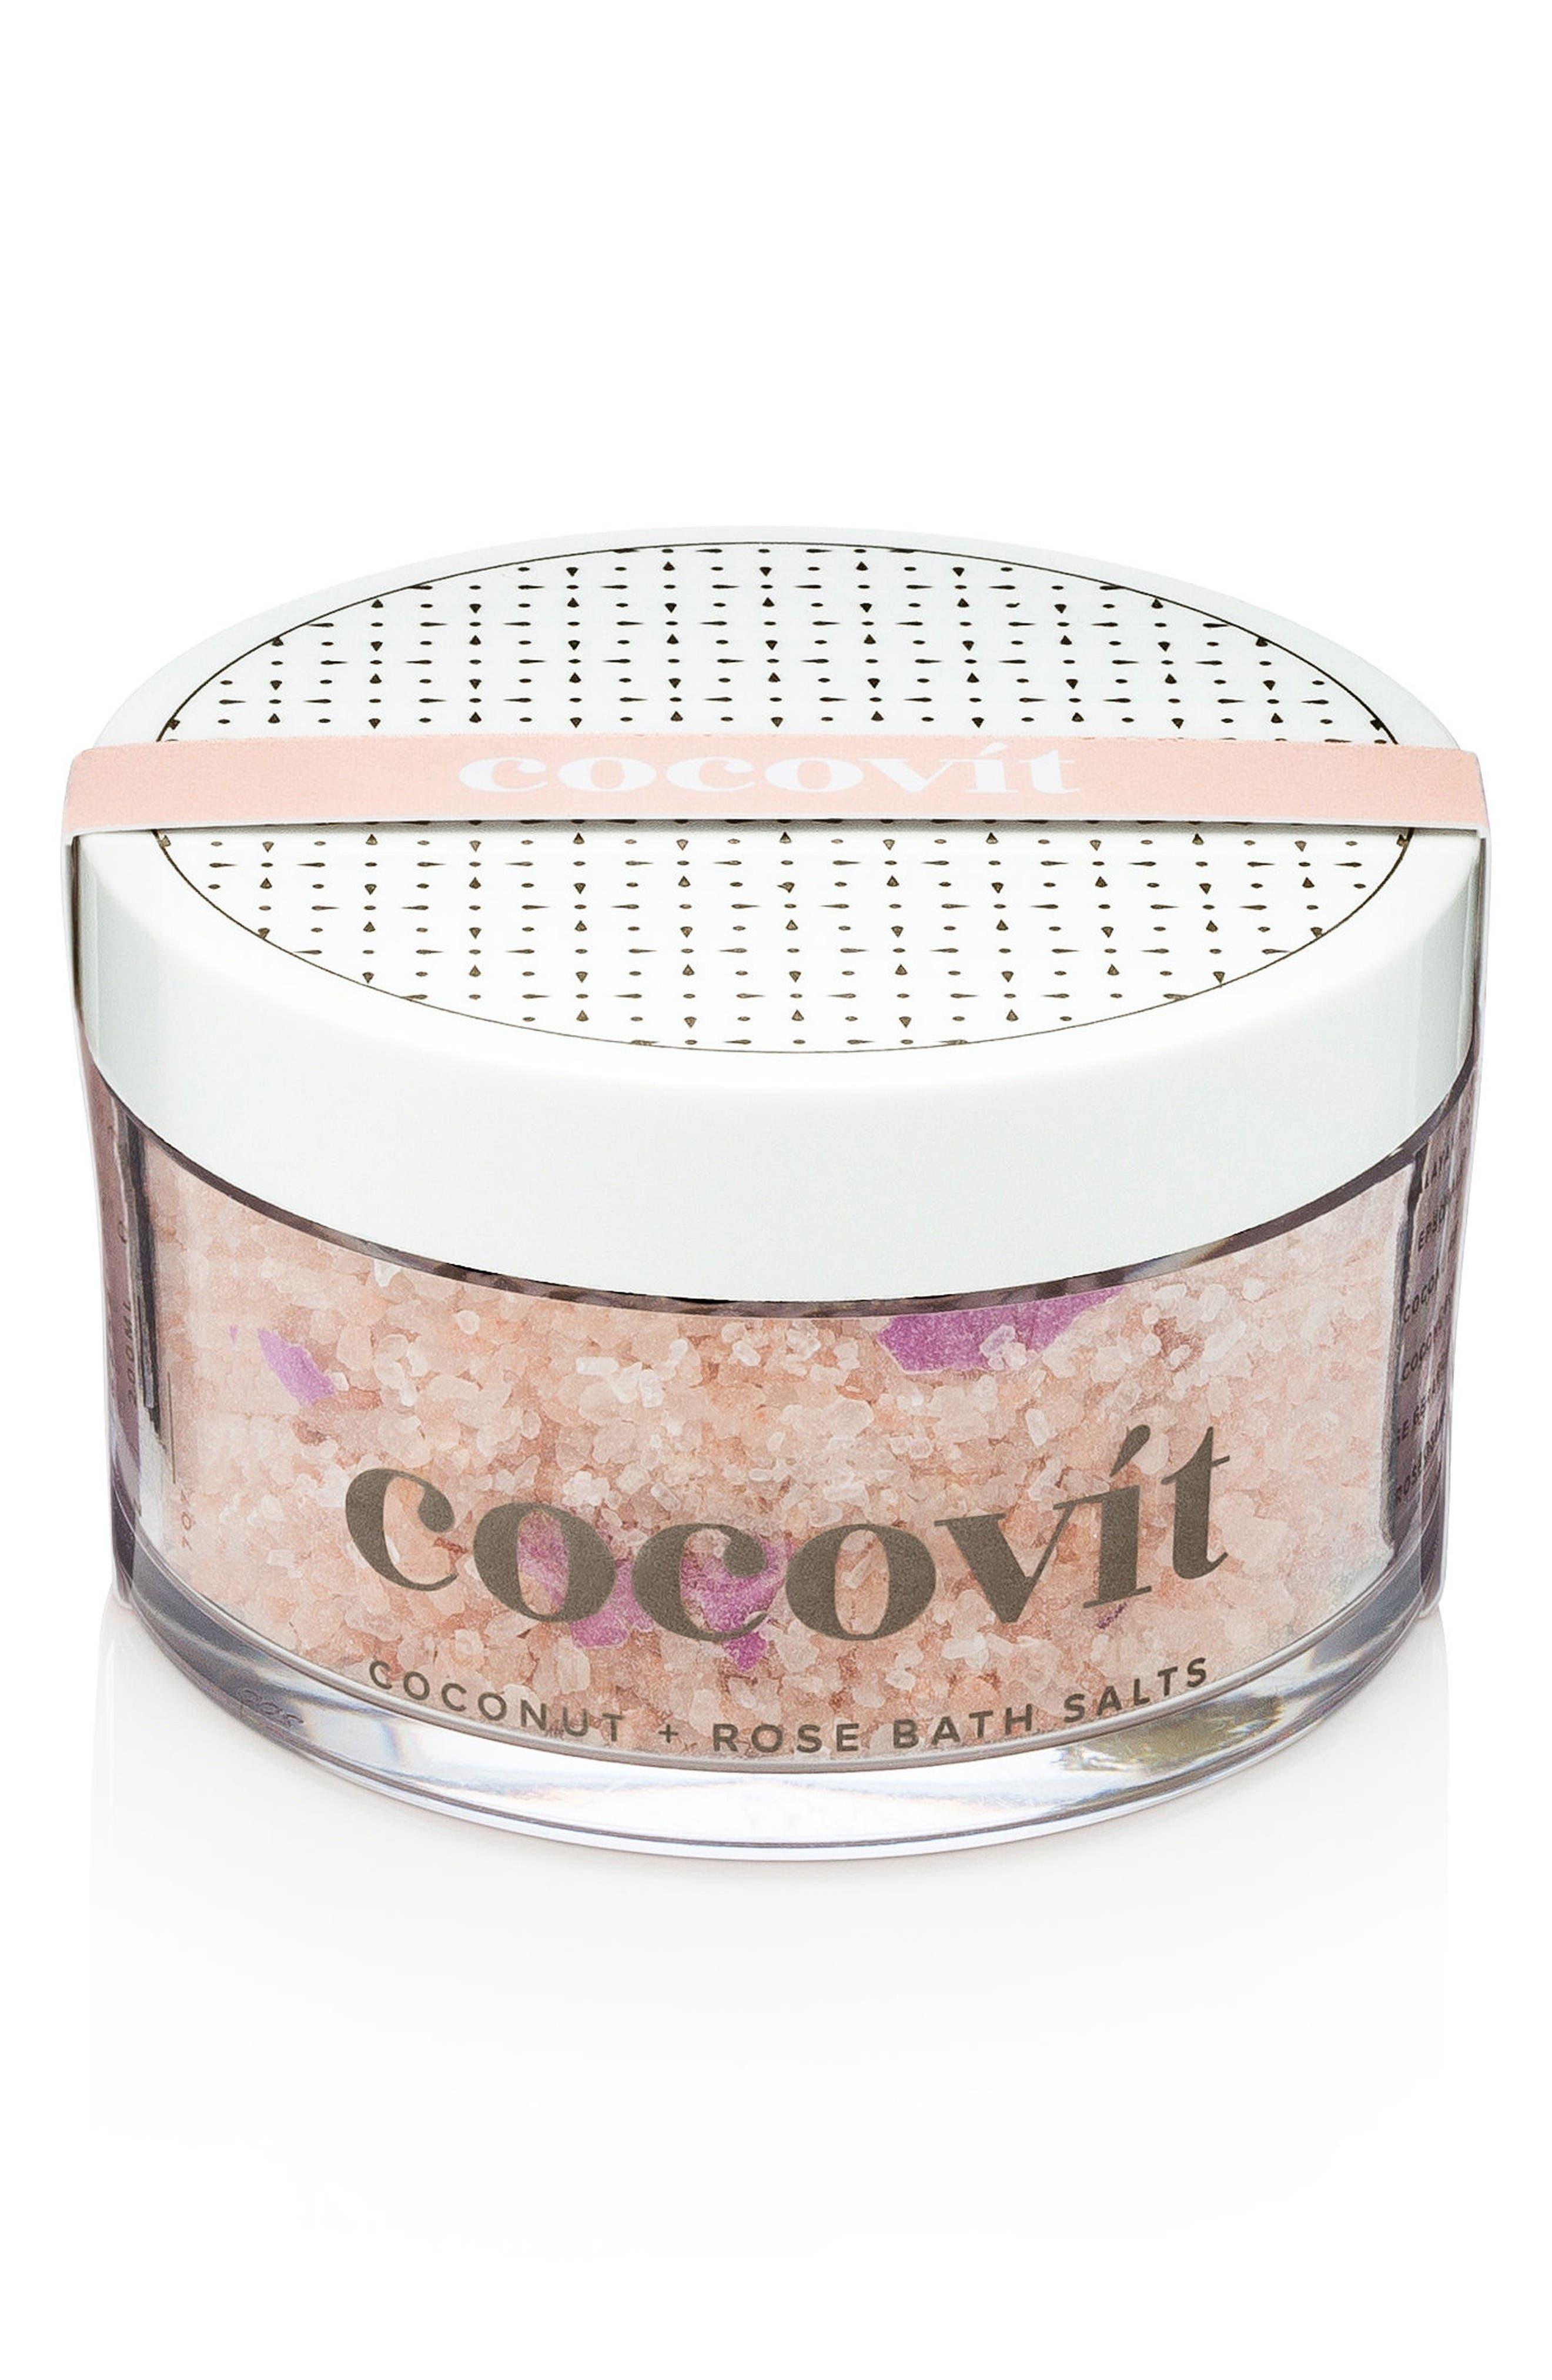 Coconut + Rose Bath Salts,                         Main,                         color, No Color